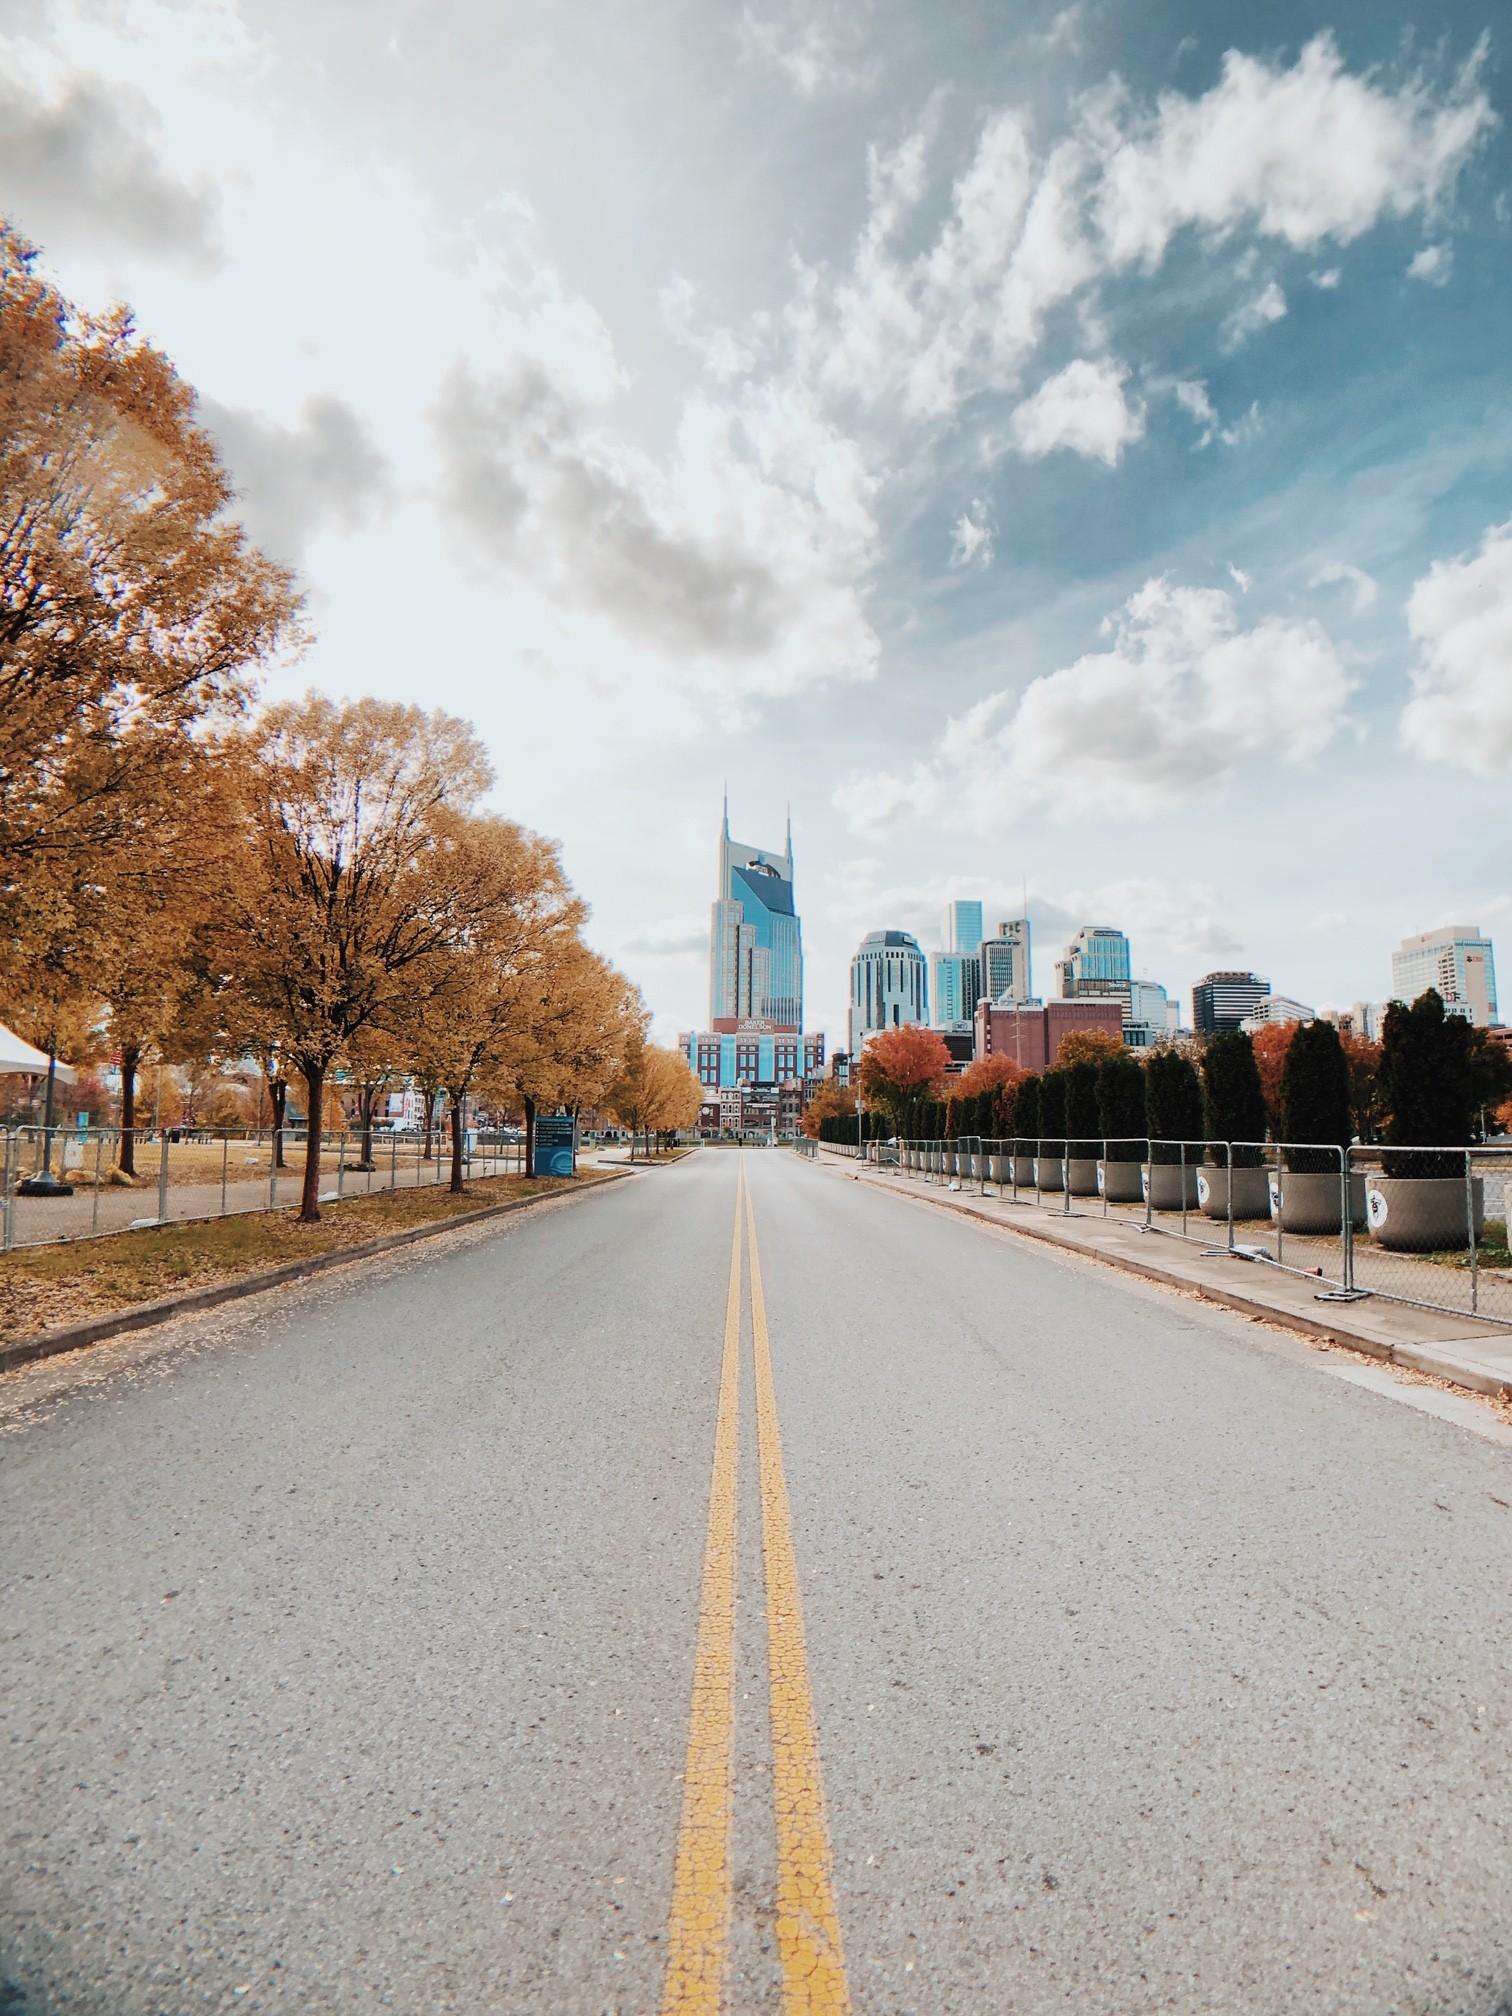 Metropolitan Government of Nashville and Davidson County